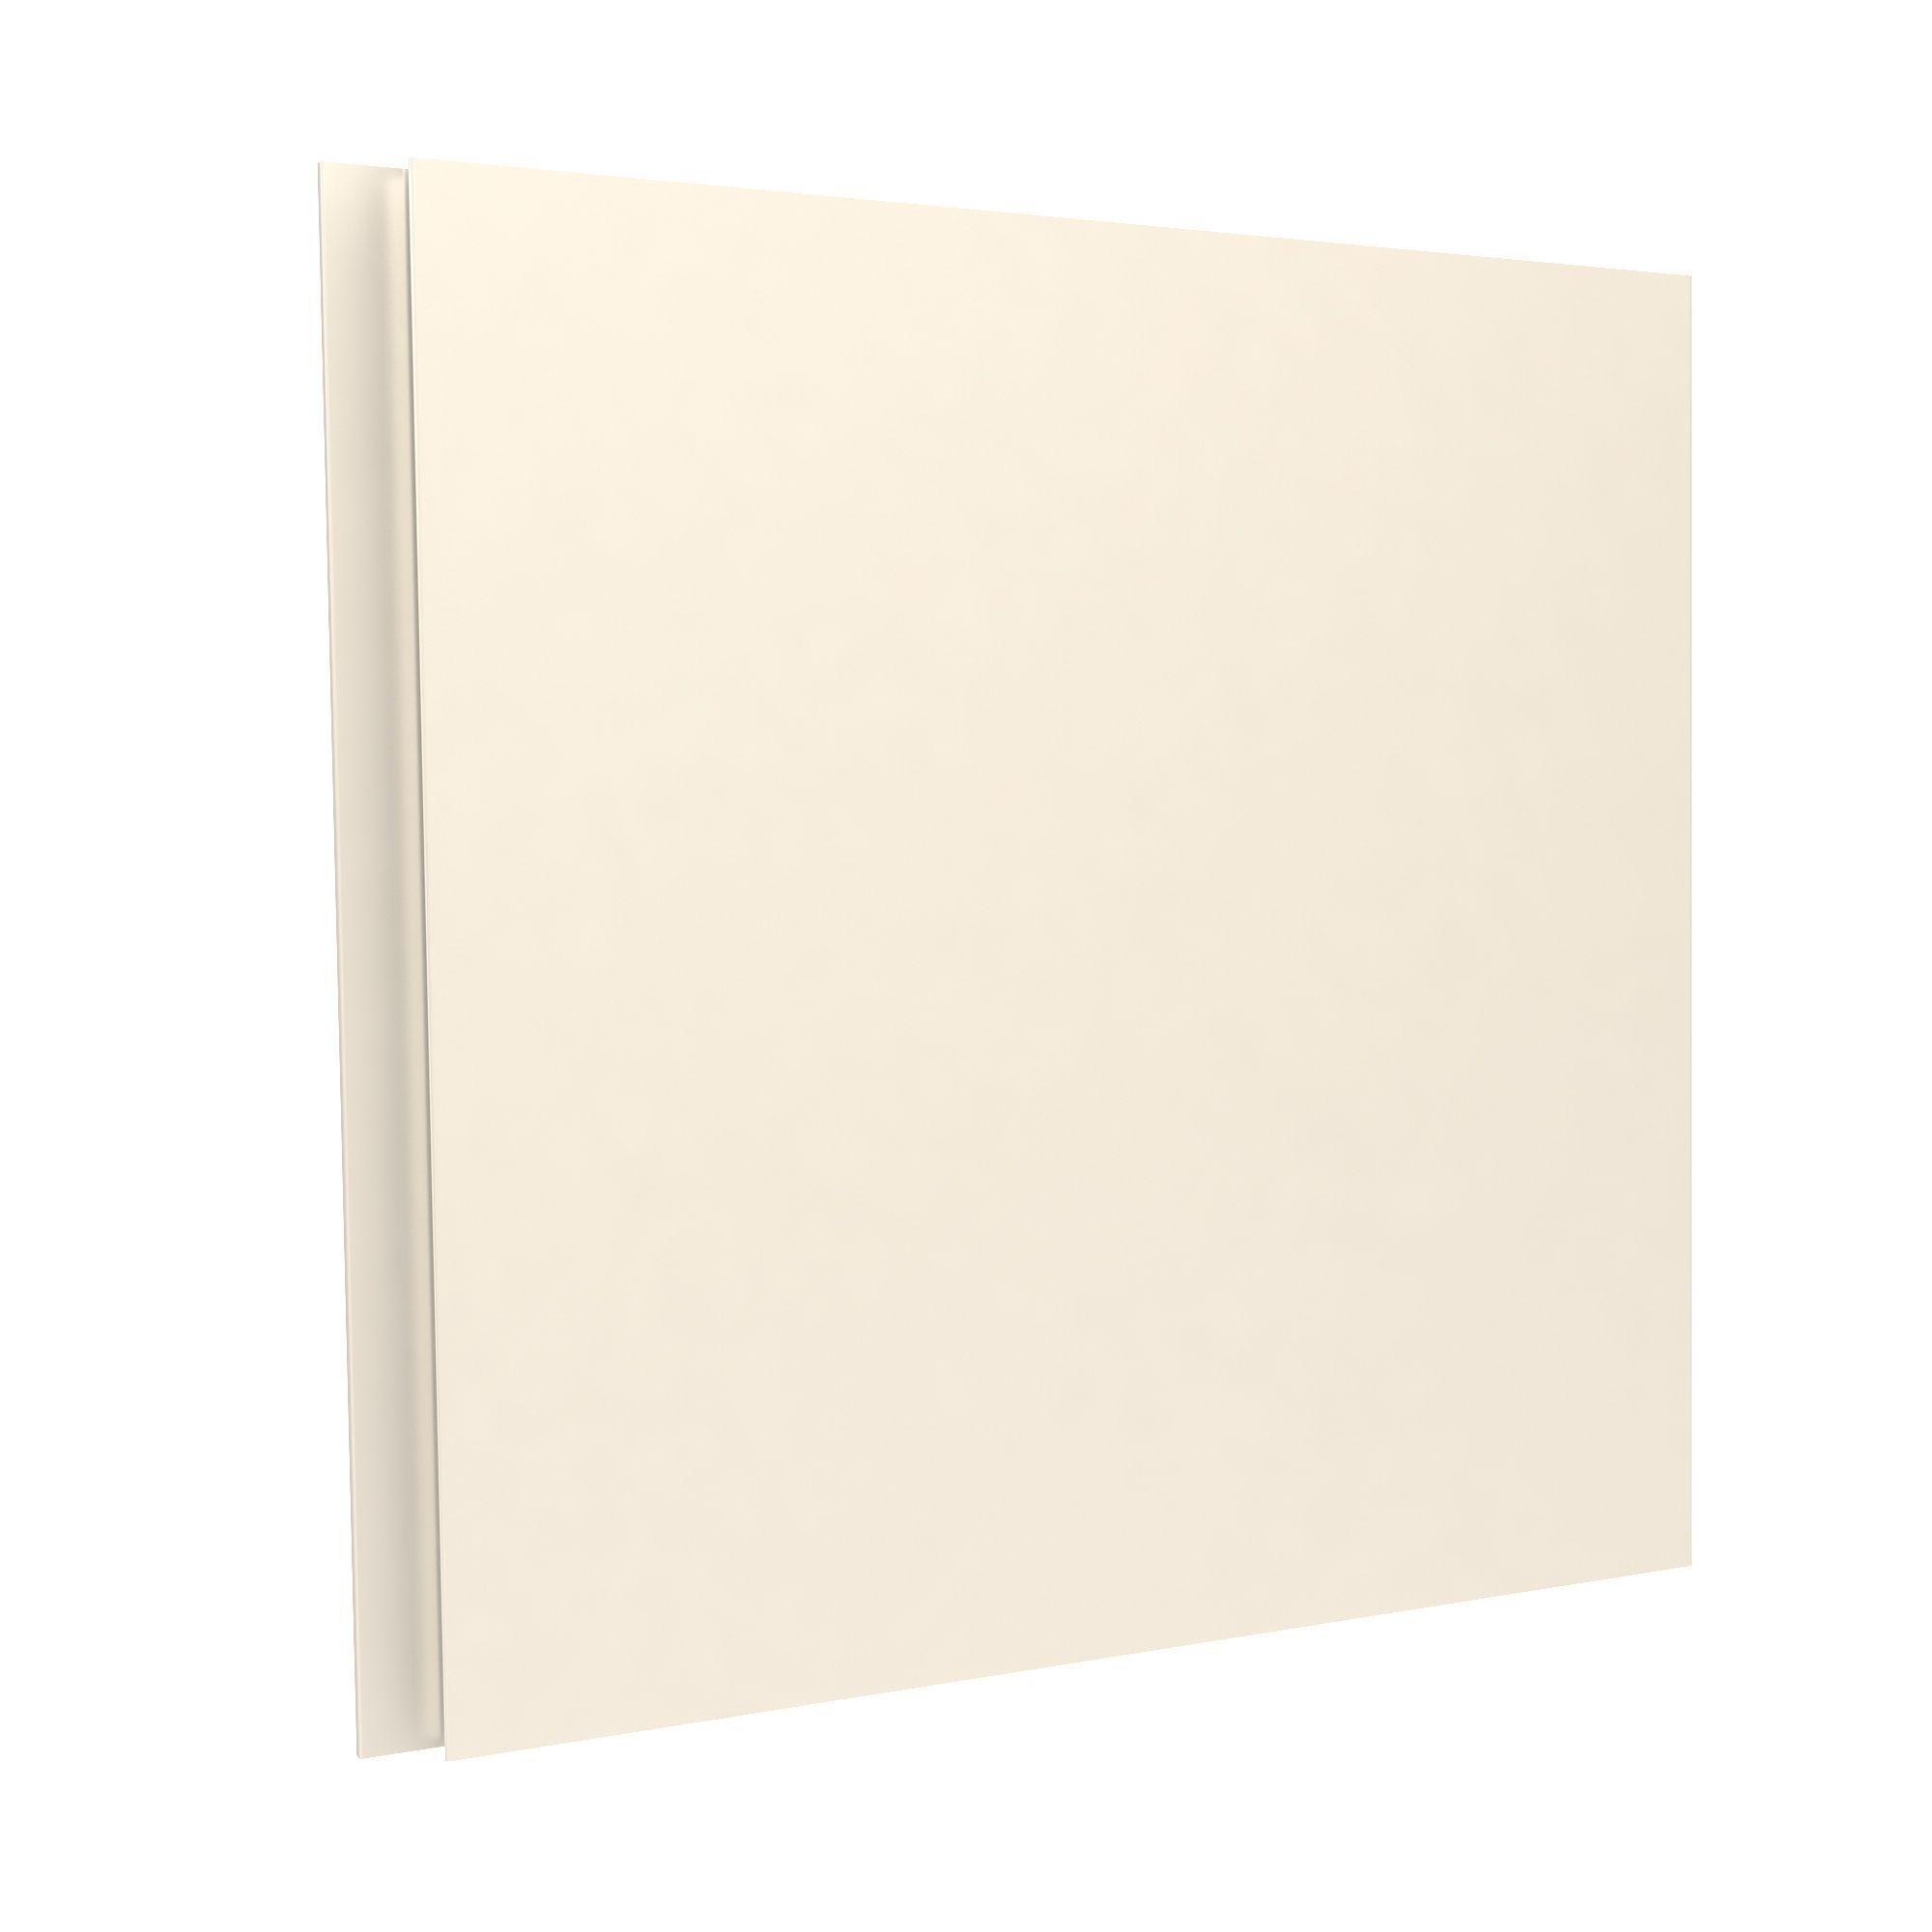 Darwin Modular Cream Bedside Cabinet Door With Integrated Handle (h)478 Mm (w)497 Mm